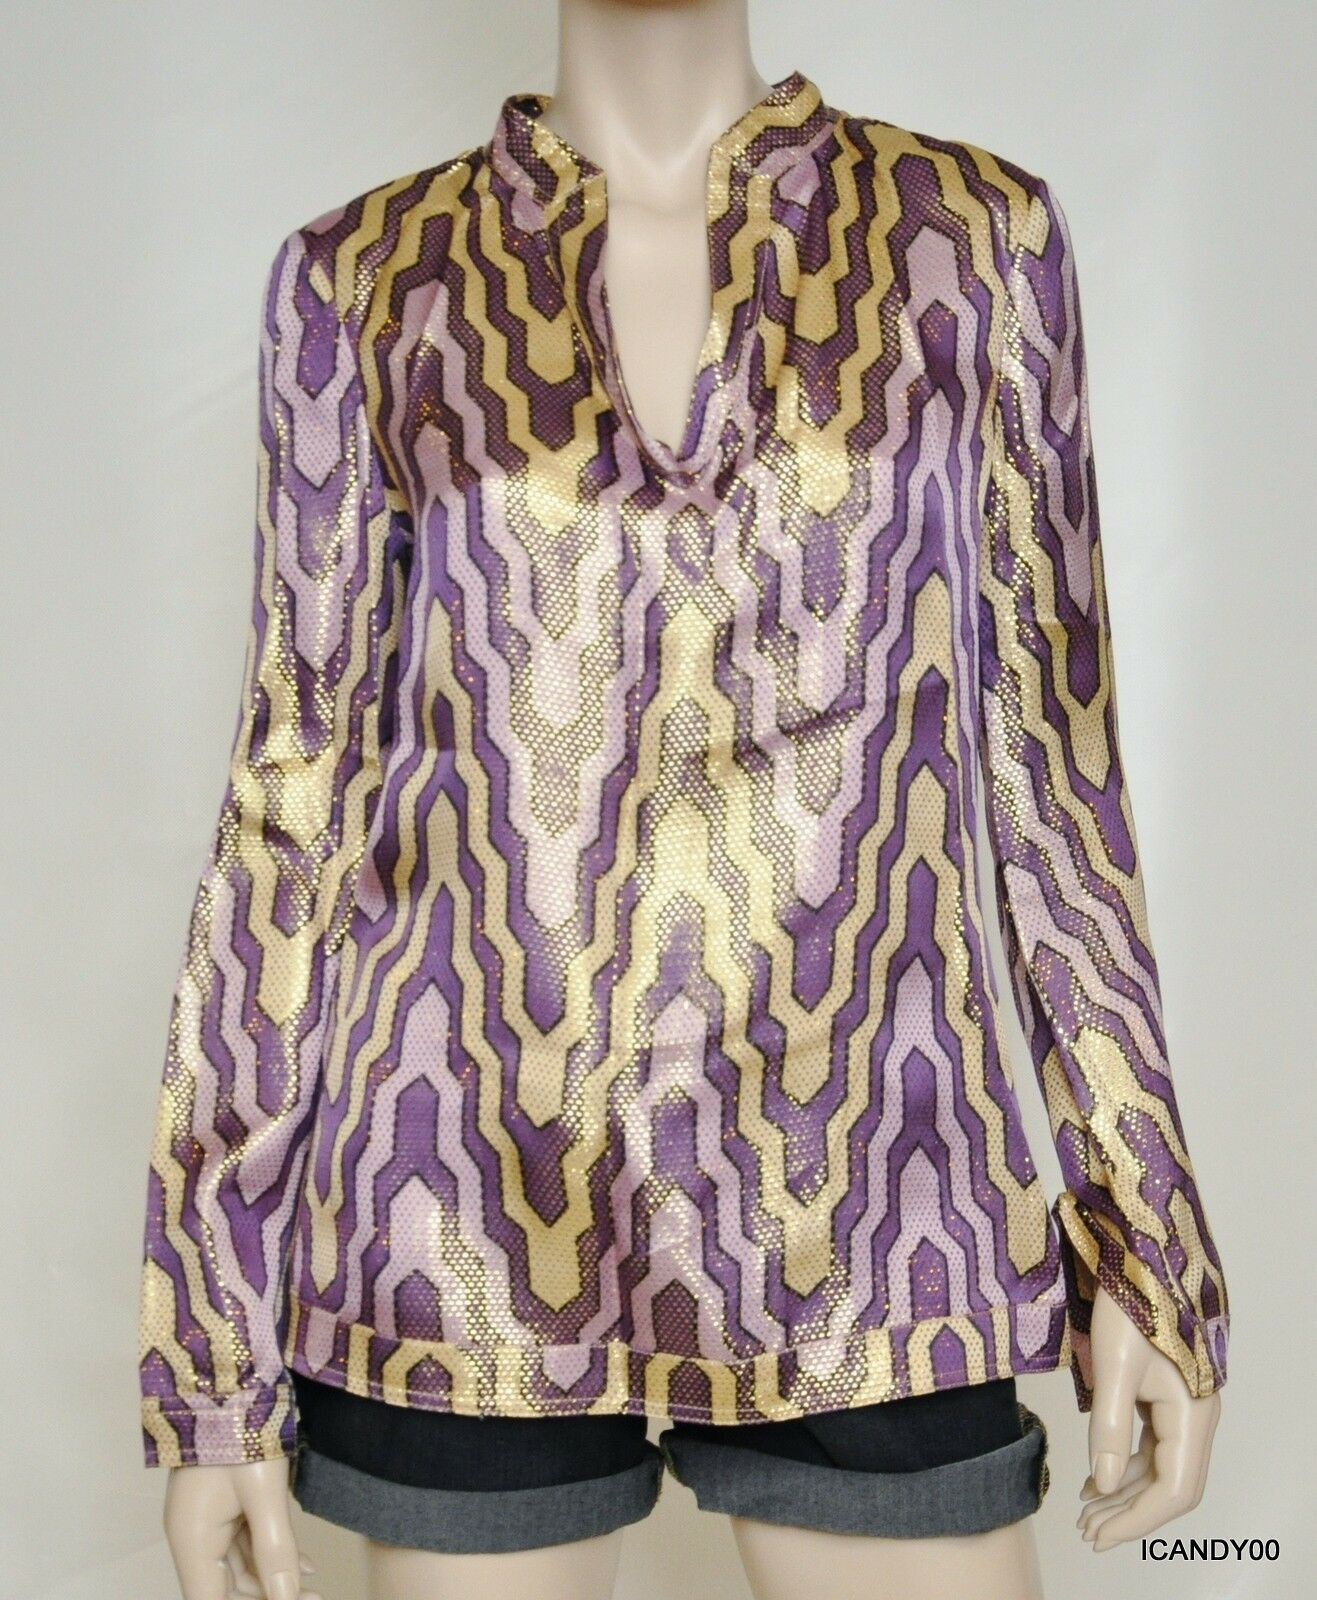 Nwt  Tory Burch STEPHANIE Silk Metallic Tunic Blouse Shirt Top lila Gold 6